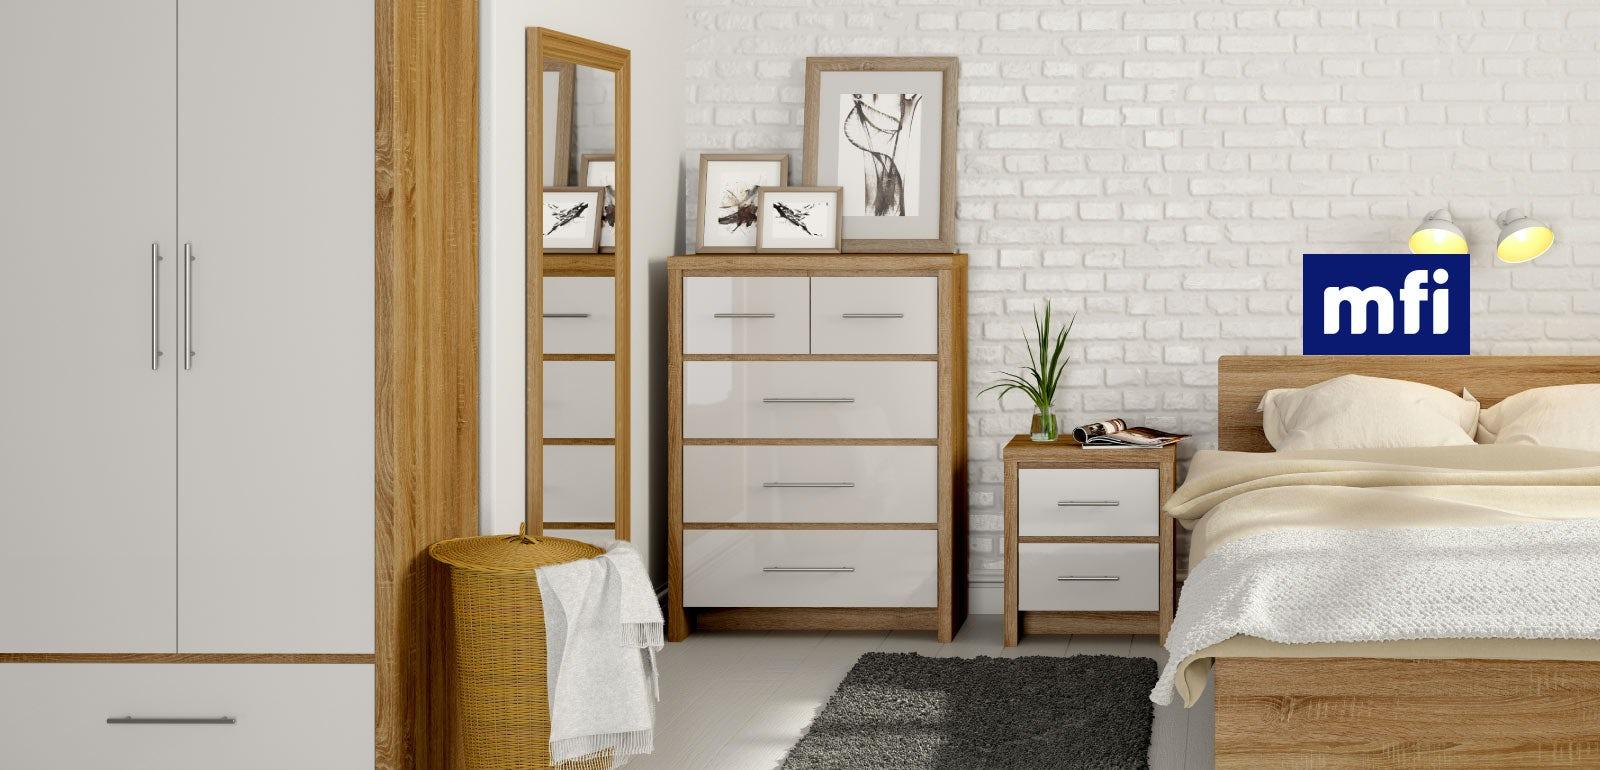 white gloss bedroom furniture sale 28 images white  : 38e848bc ba4e 4282 aec0 9d08f4ac9685 from christmasornamentsallyear.com size 1600 x 770 jpeg 176kB